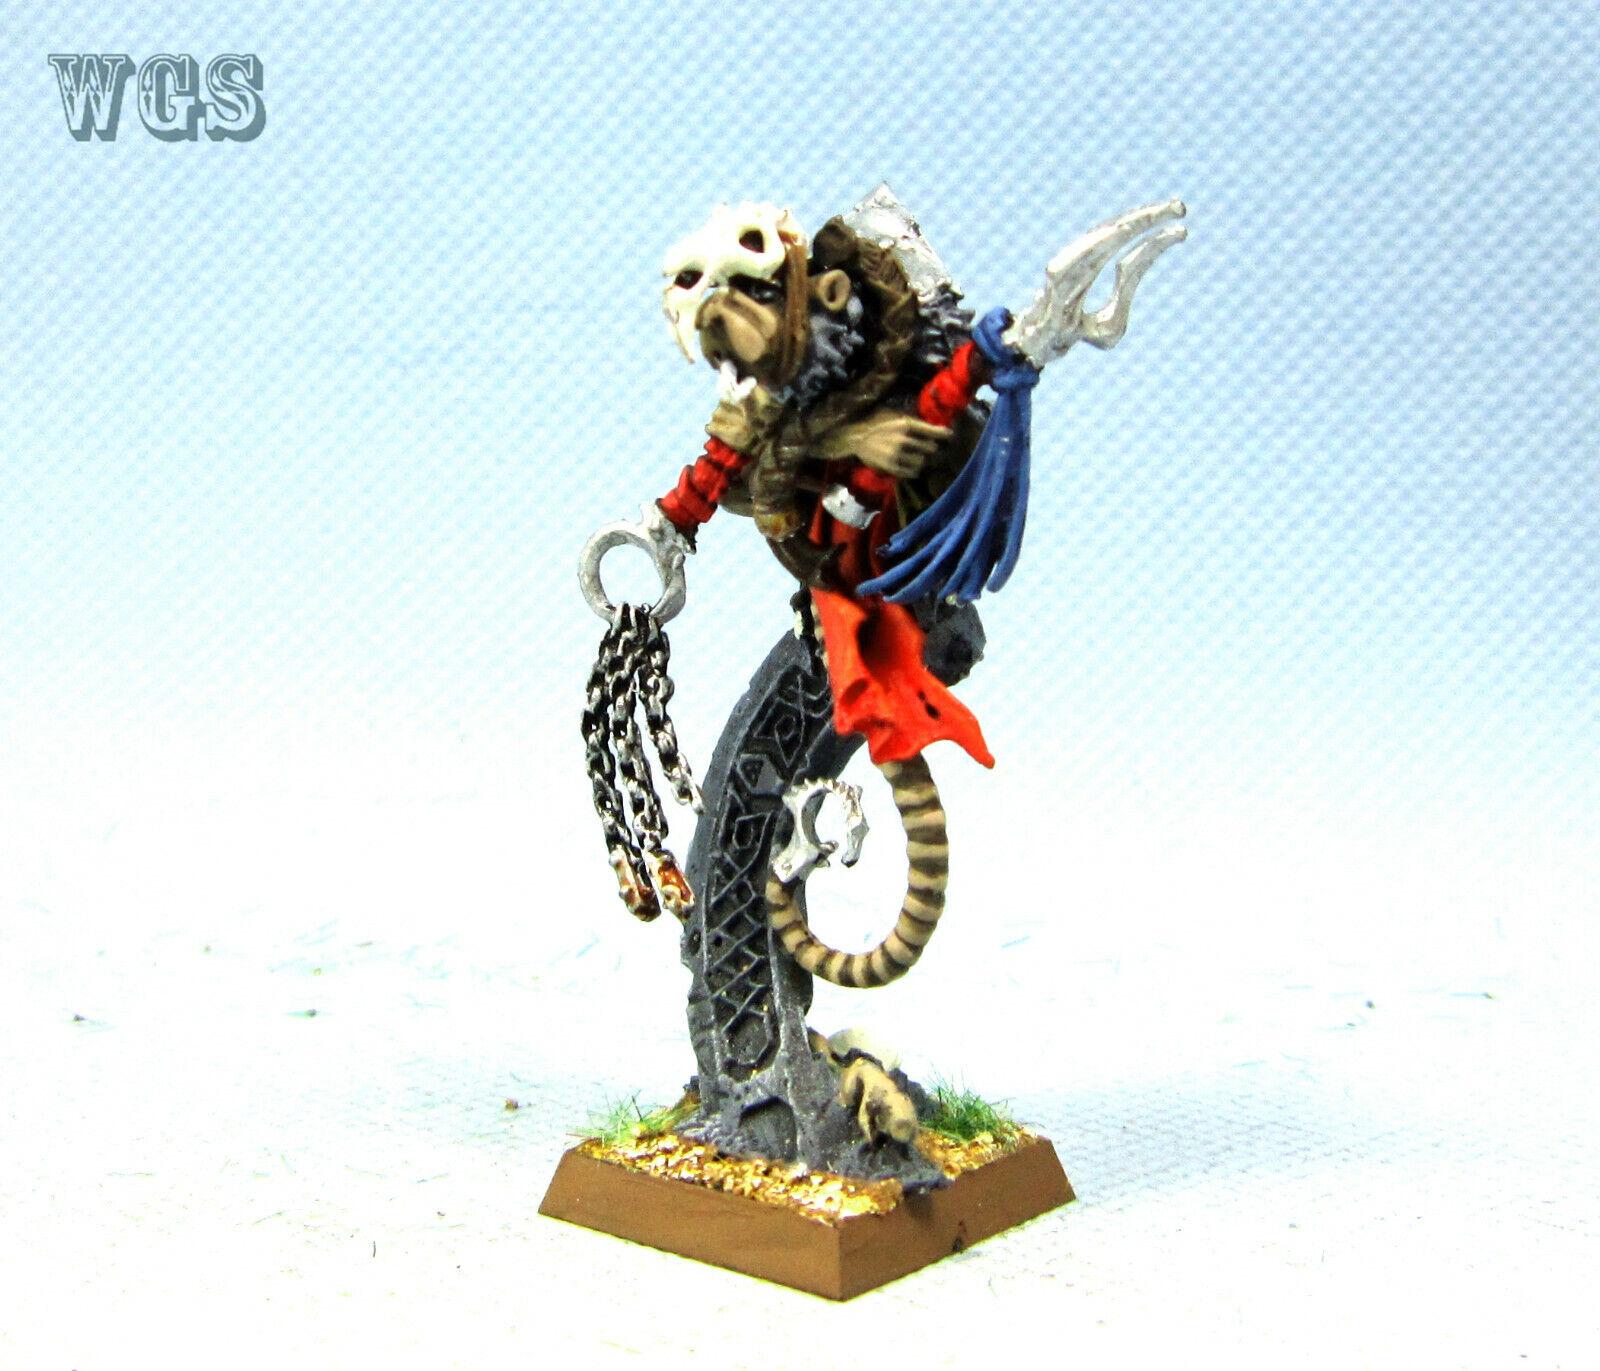 25mm  Warhammer Fantasy WGS painted Skaven Tretch Craventail SK031  pas cher en haute qualité